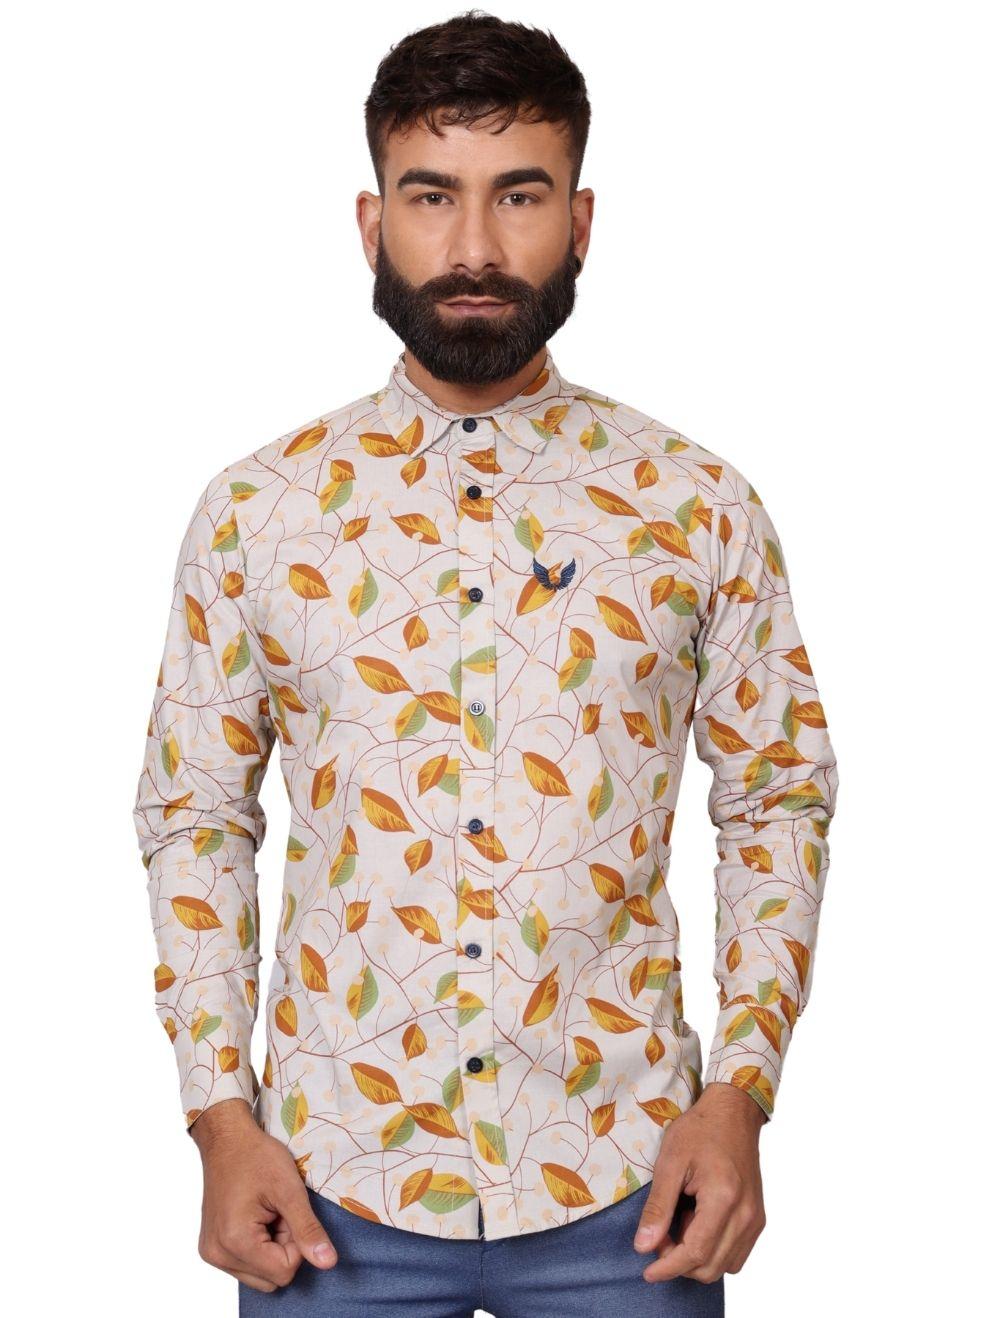 Camisa Masculina Slim Manga Longa com Elastano Folhas